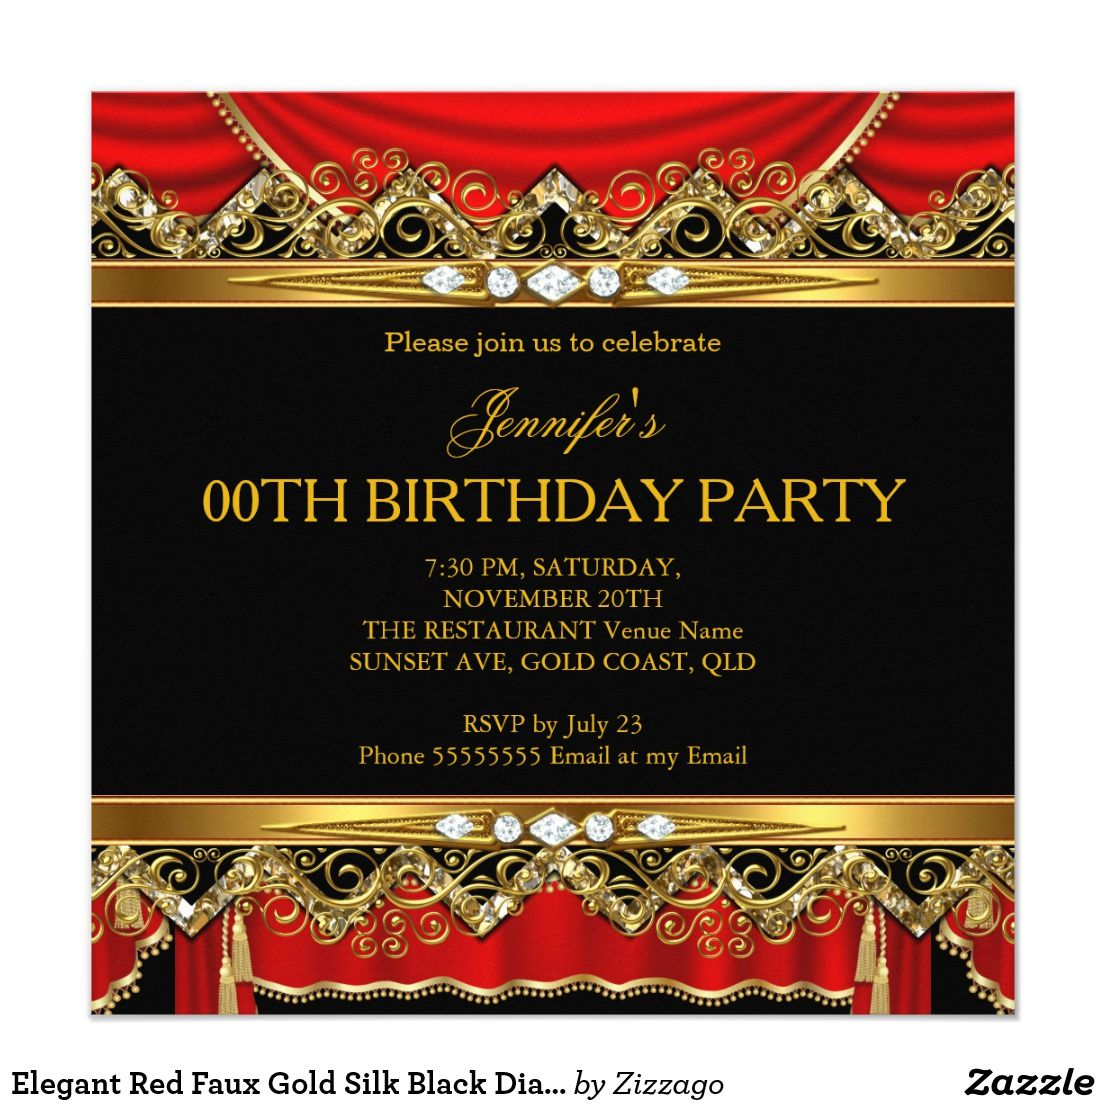 Elegant Red Faux Gold Silk Black Diamond Invite   Zazzle.com   Diamond  invitations, Girl birthday party invitations, Elegant invitations